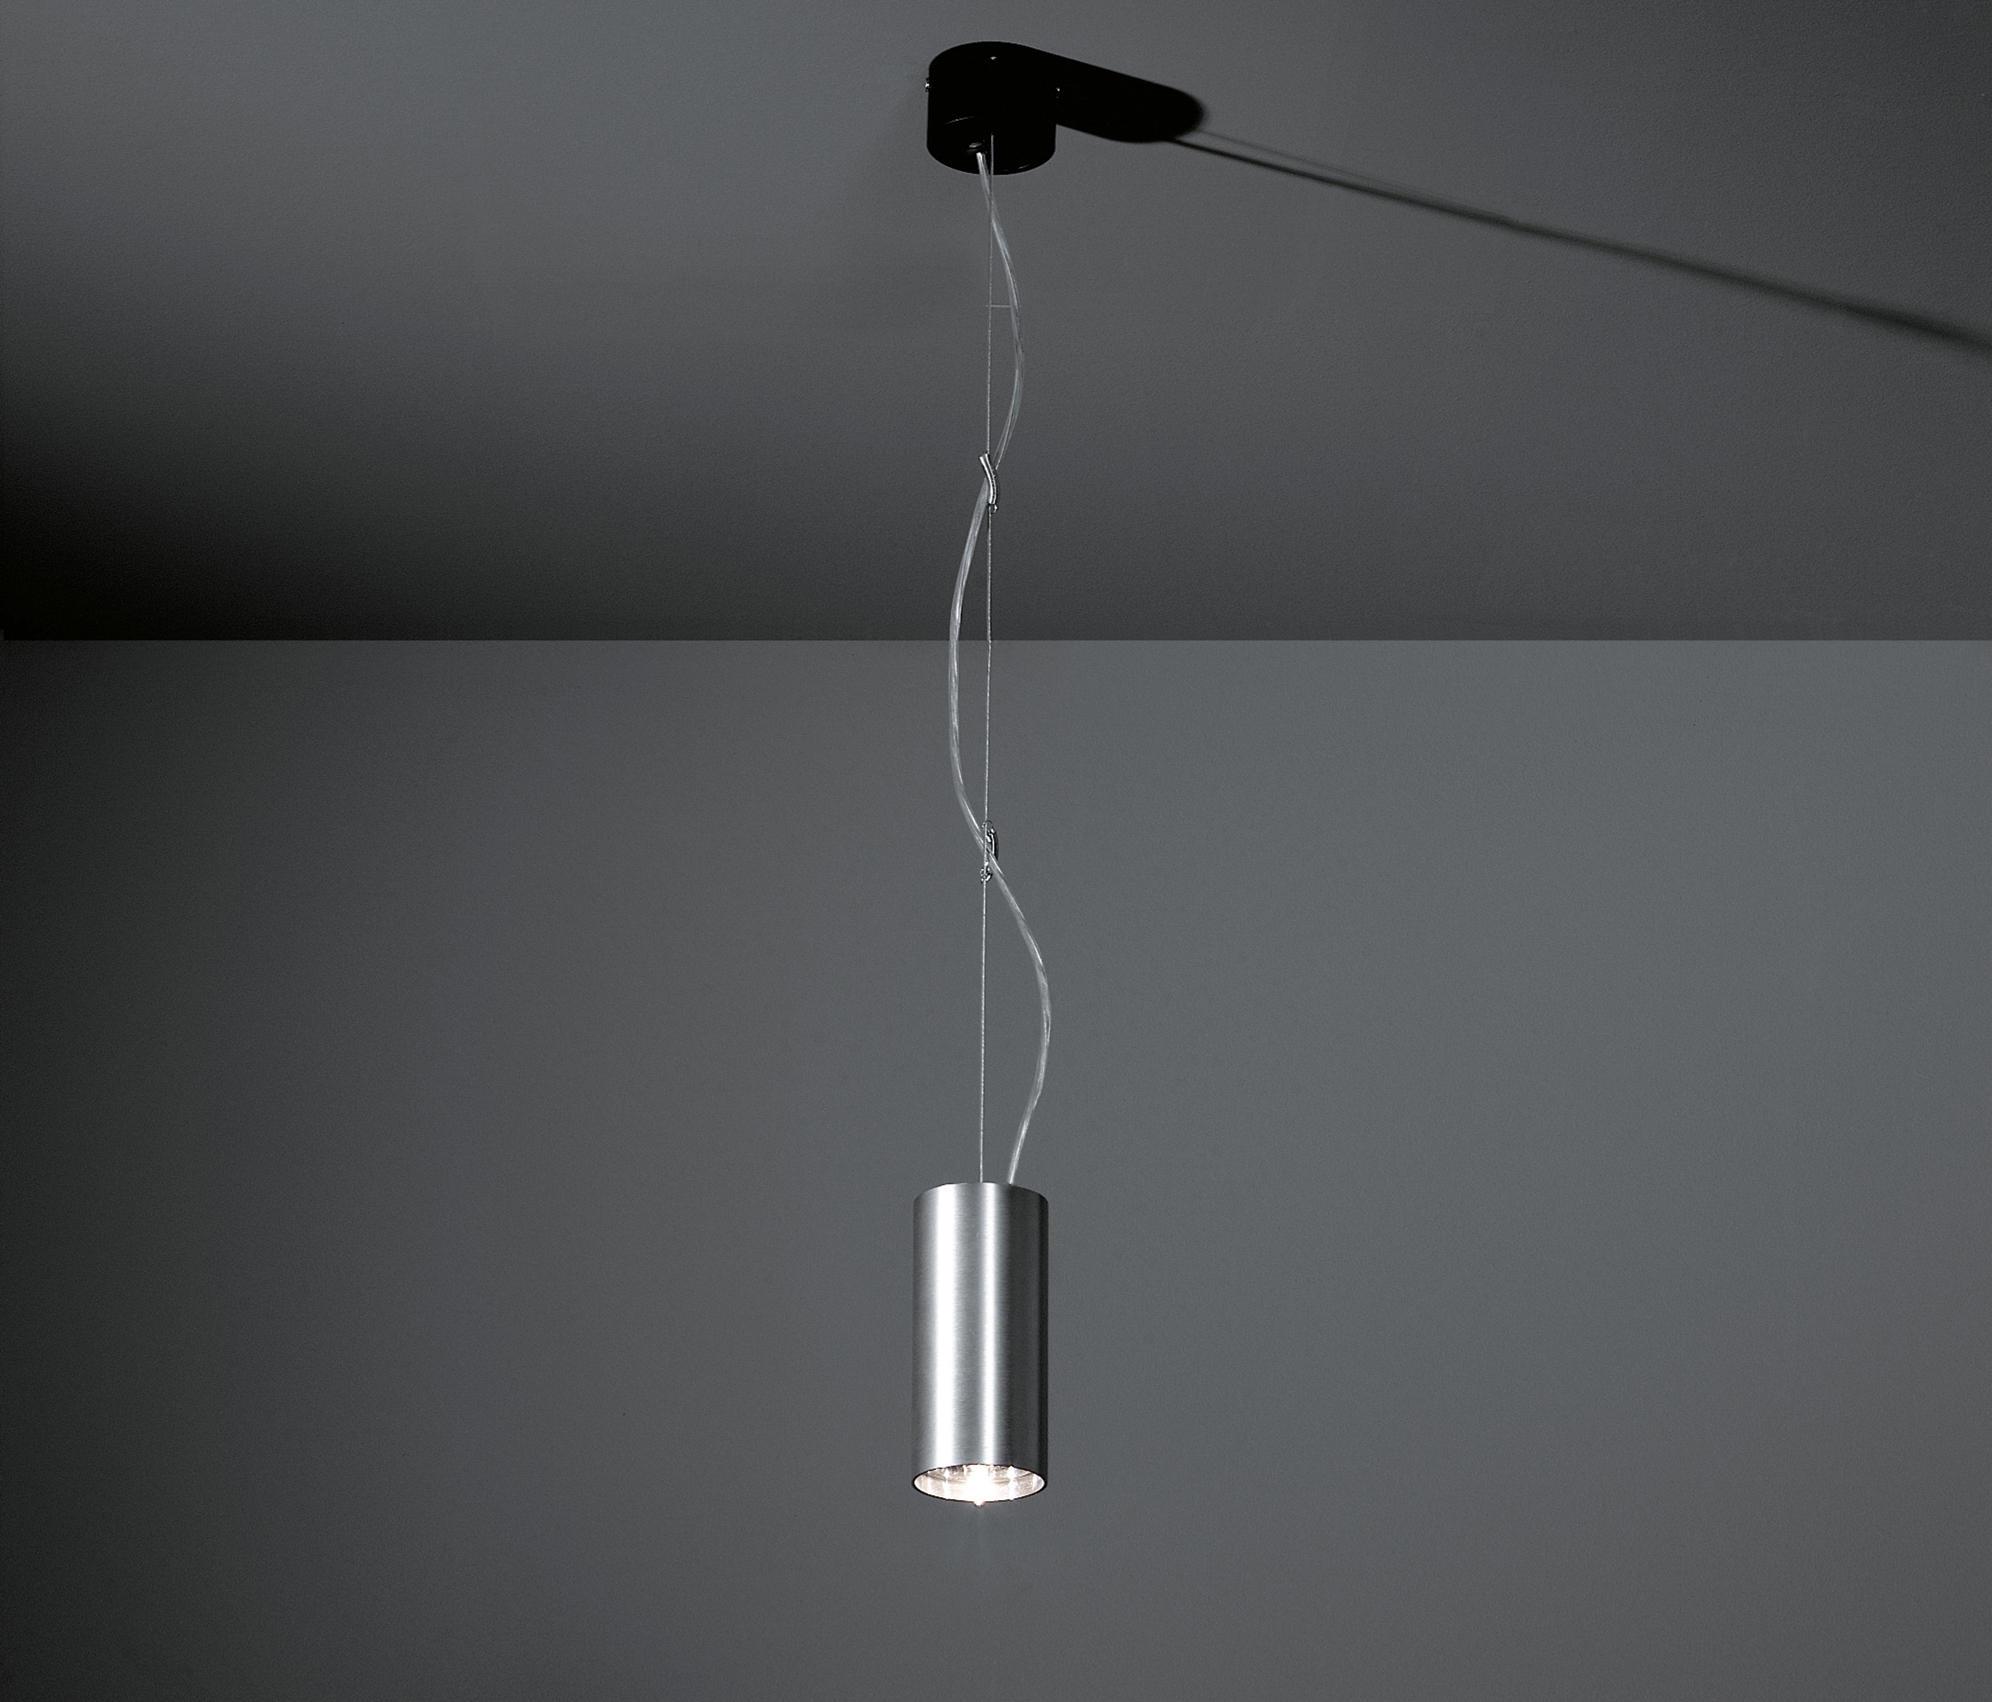 suspended lighting. Nude Suspension PAR20 By Modular Lighting Instruments   Suspended Lights